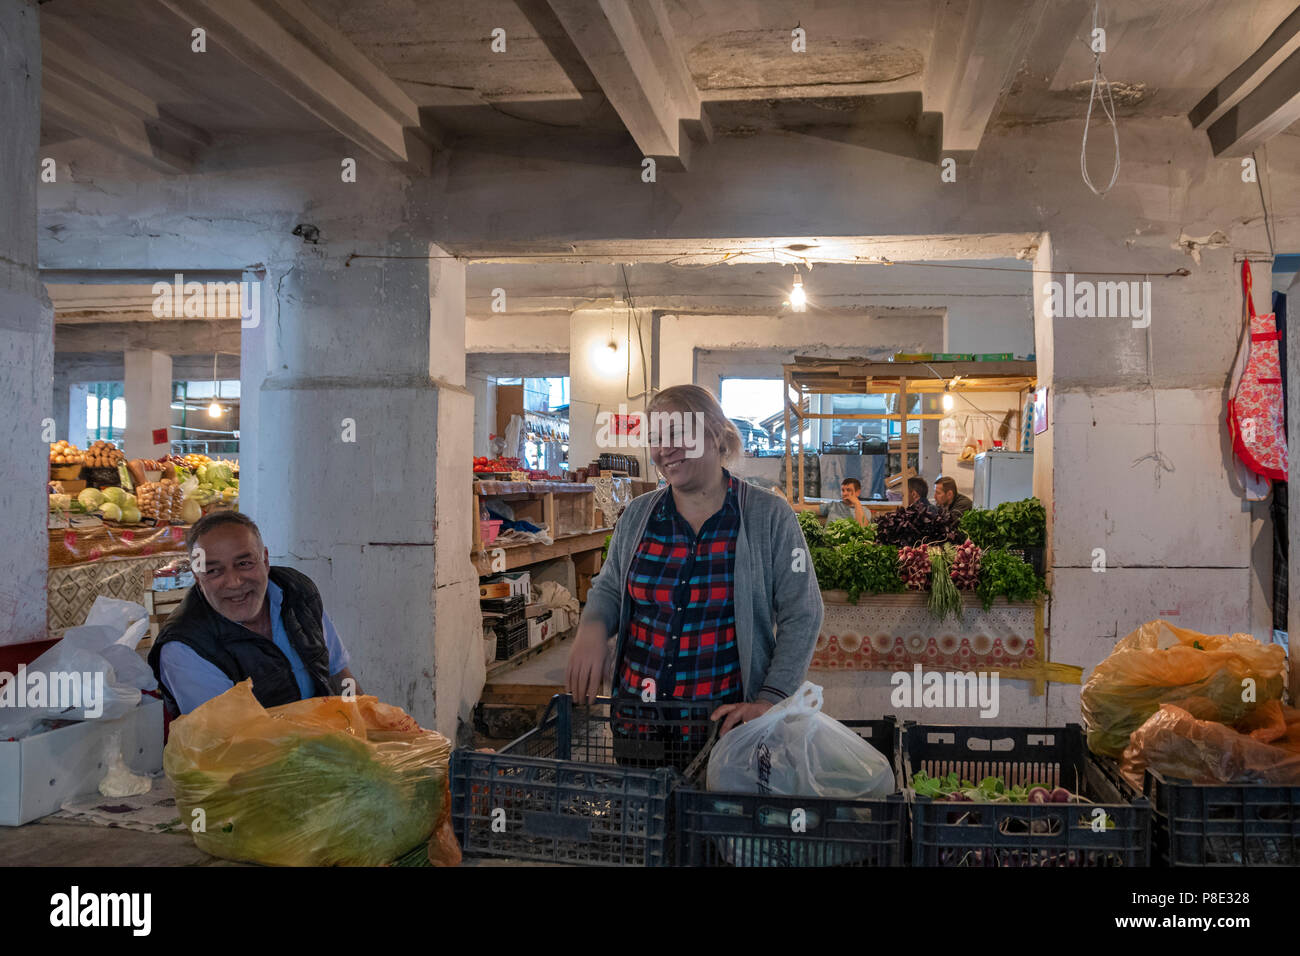 Teze Bazaar, Baku, Azerbaijan - Stock Image